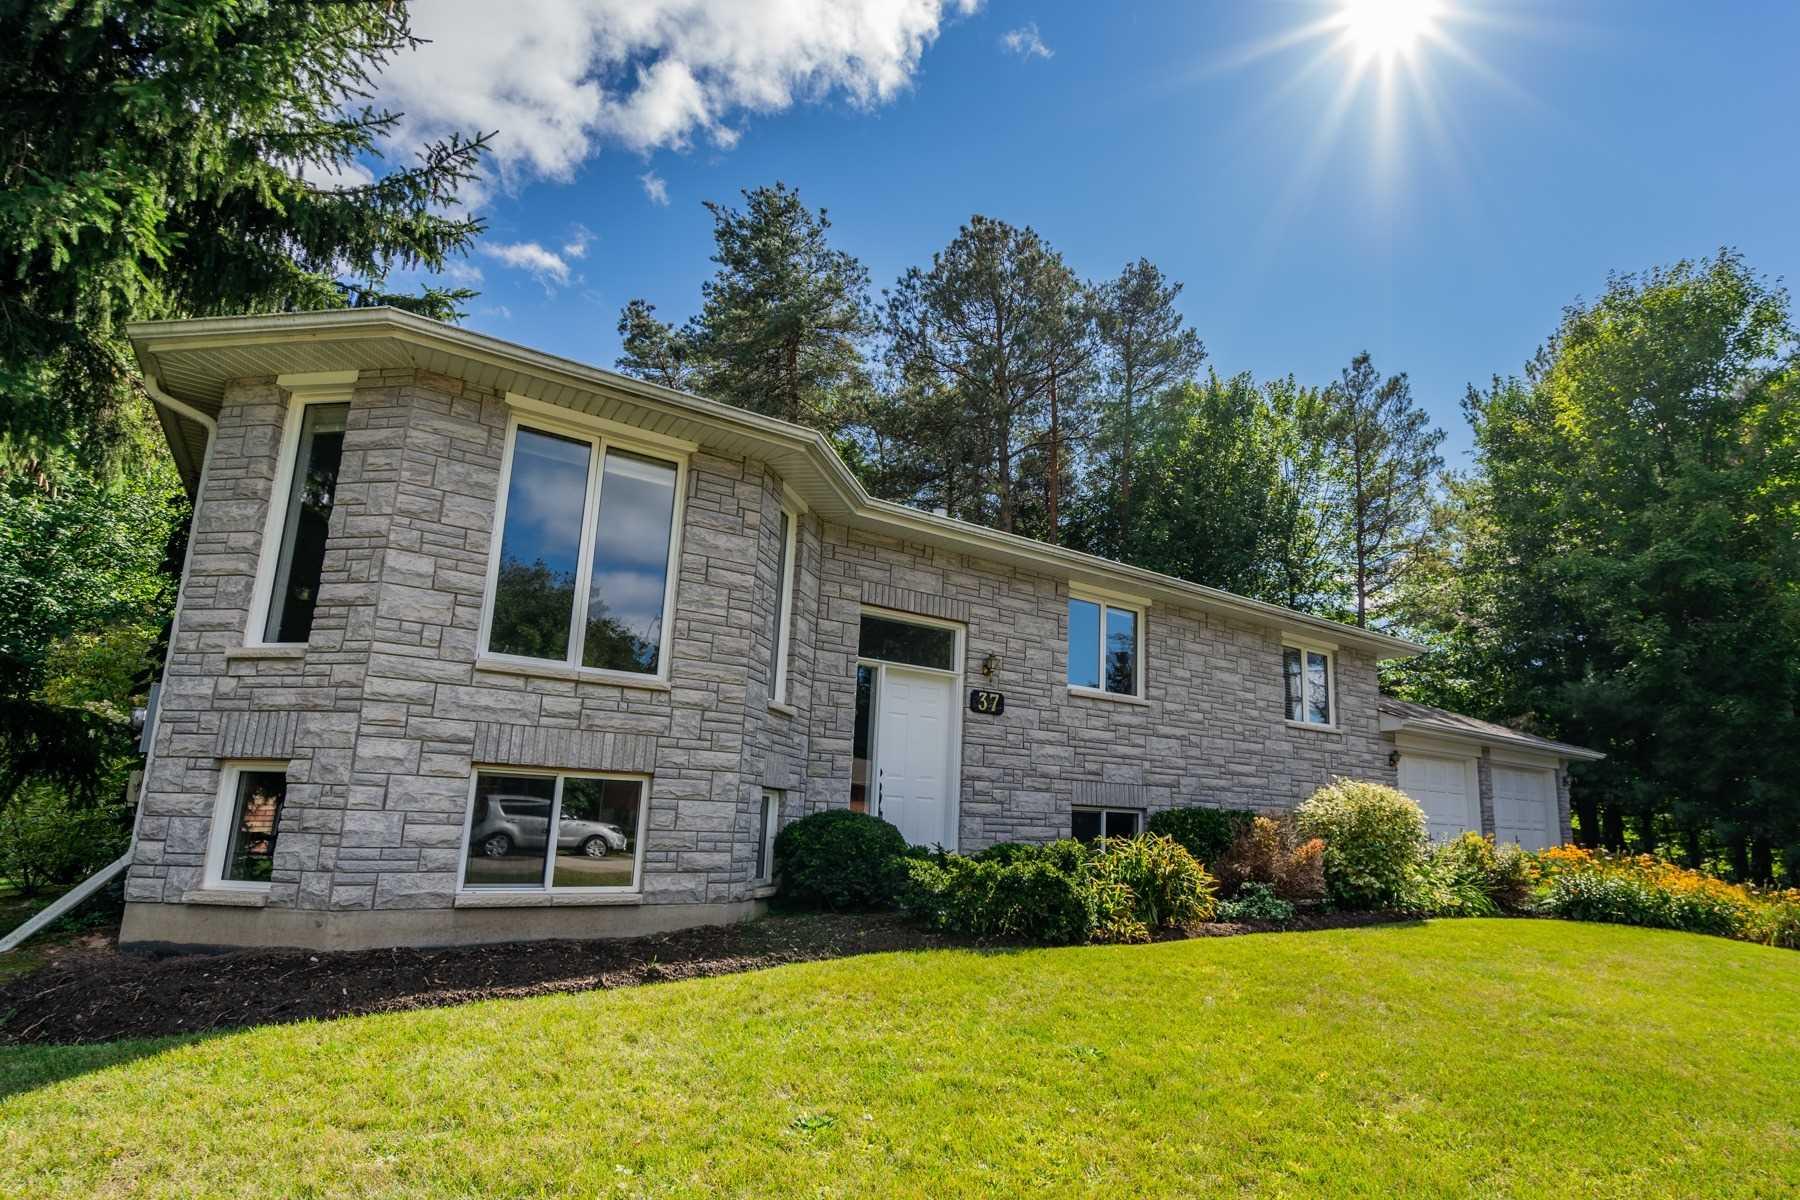 Detached house For Sale In Adjala-Tosorontio - 37 Pine Park Blvd, Adjala-Tosorontio, Ontario, Canada L0M1J0 , 2 Bedrooms Bedrooms, ,2 BathroomsBathrooms,Detached,For Sale,Pine Park